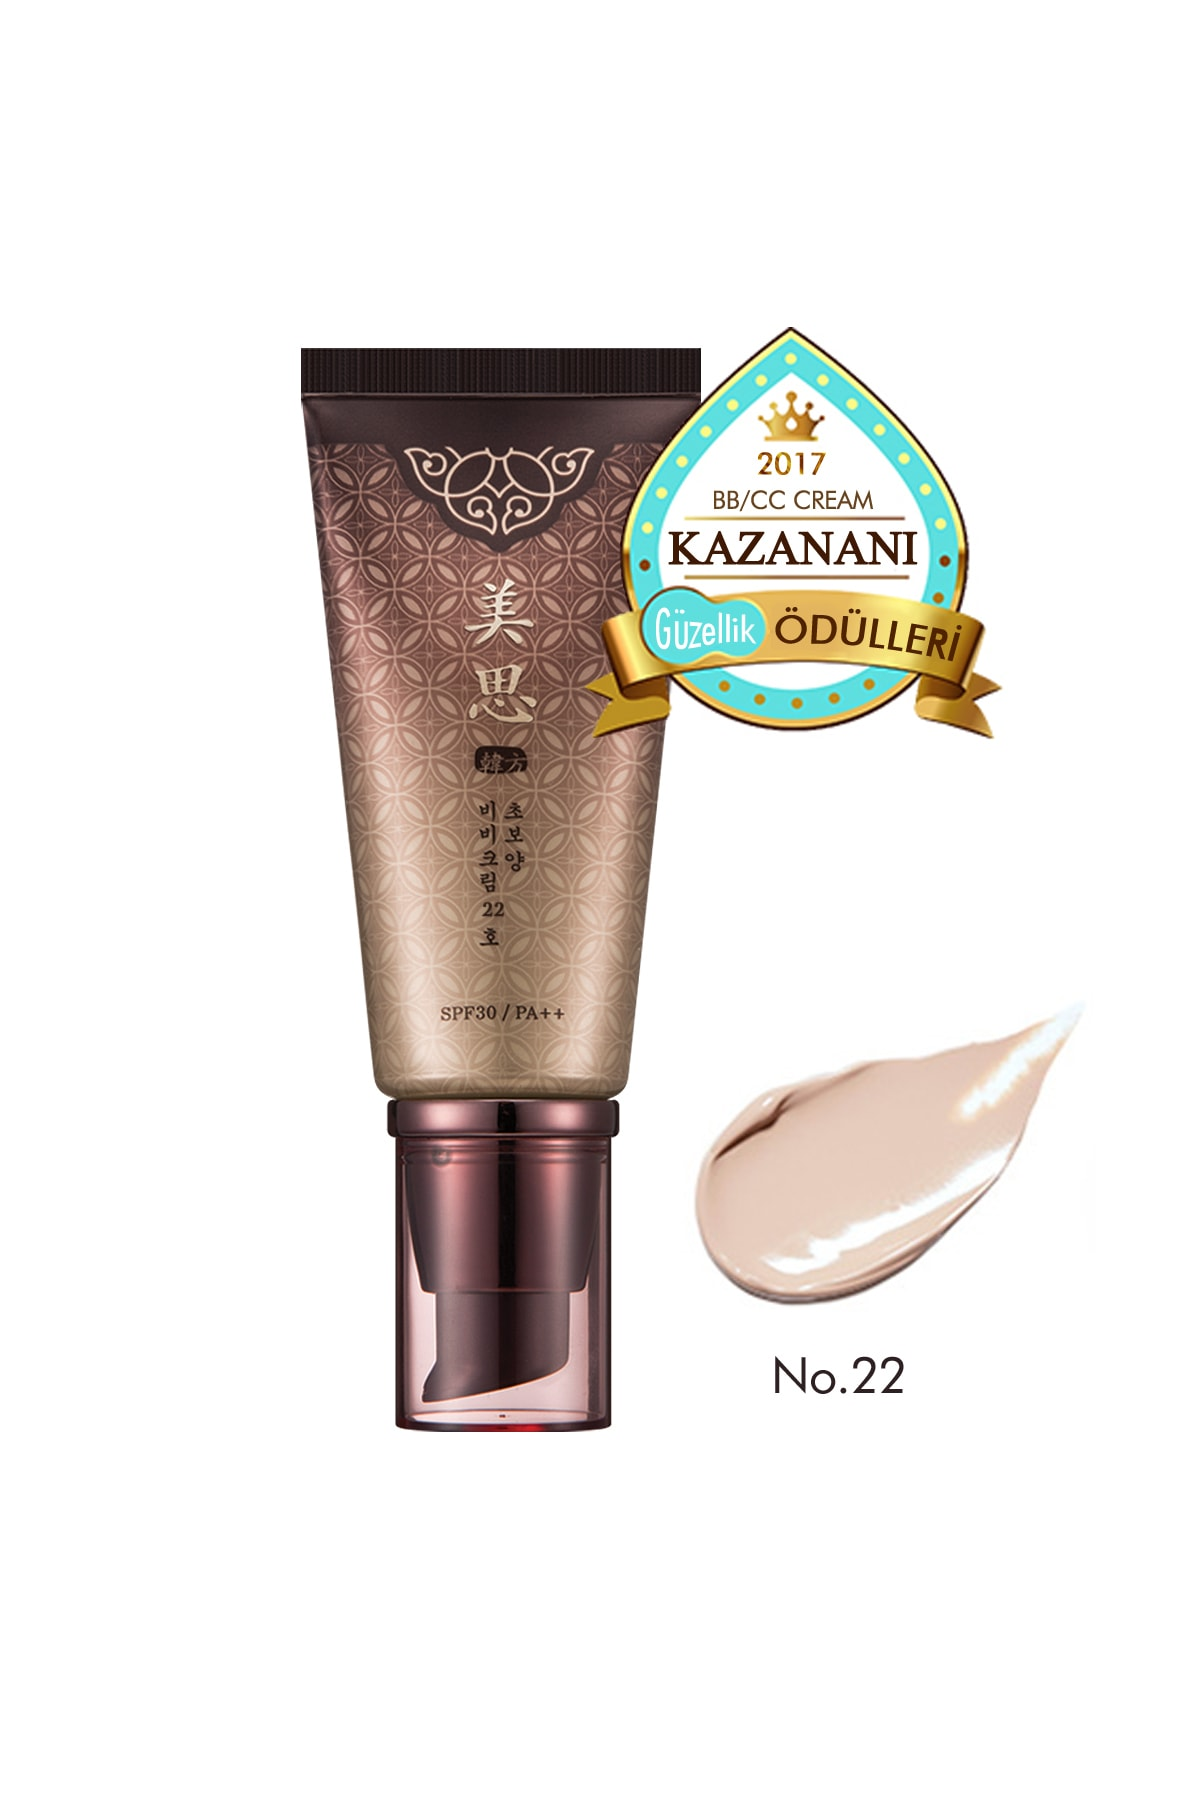 Missha Yoğun Kapatıcı Bitkisel BB Krem 50ml MISA Cho Bo Yang BB Cream SPF30/PA++ (No.22 )